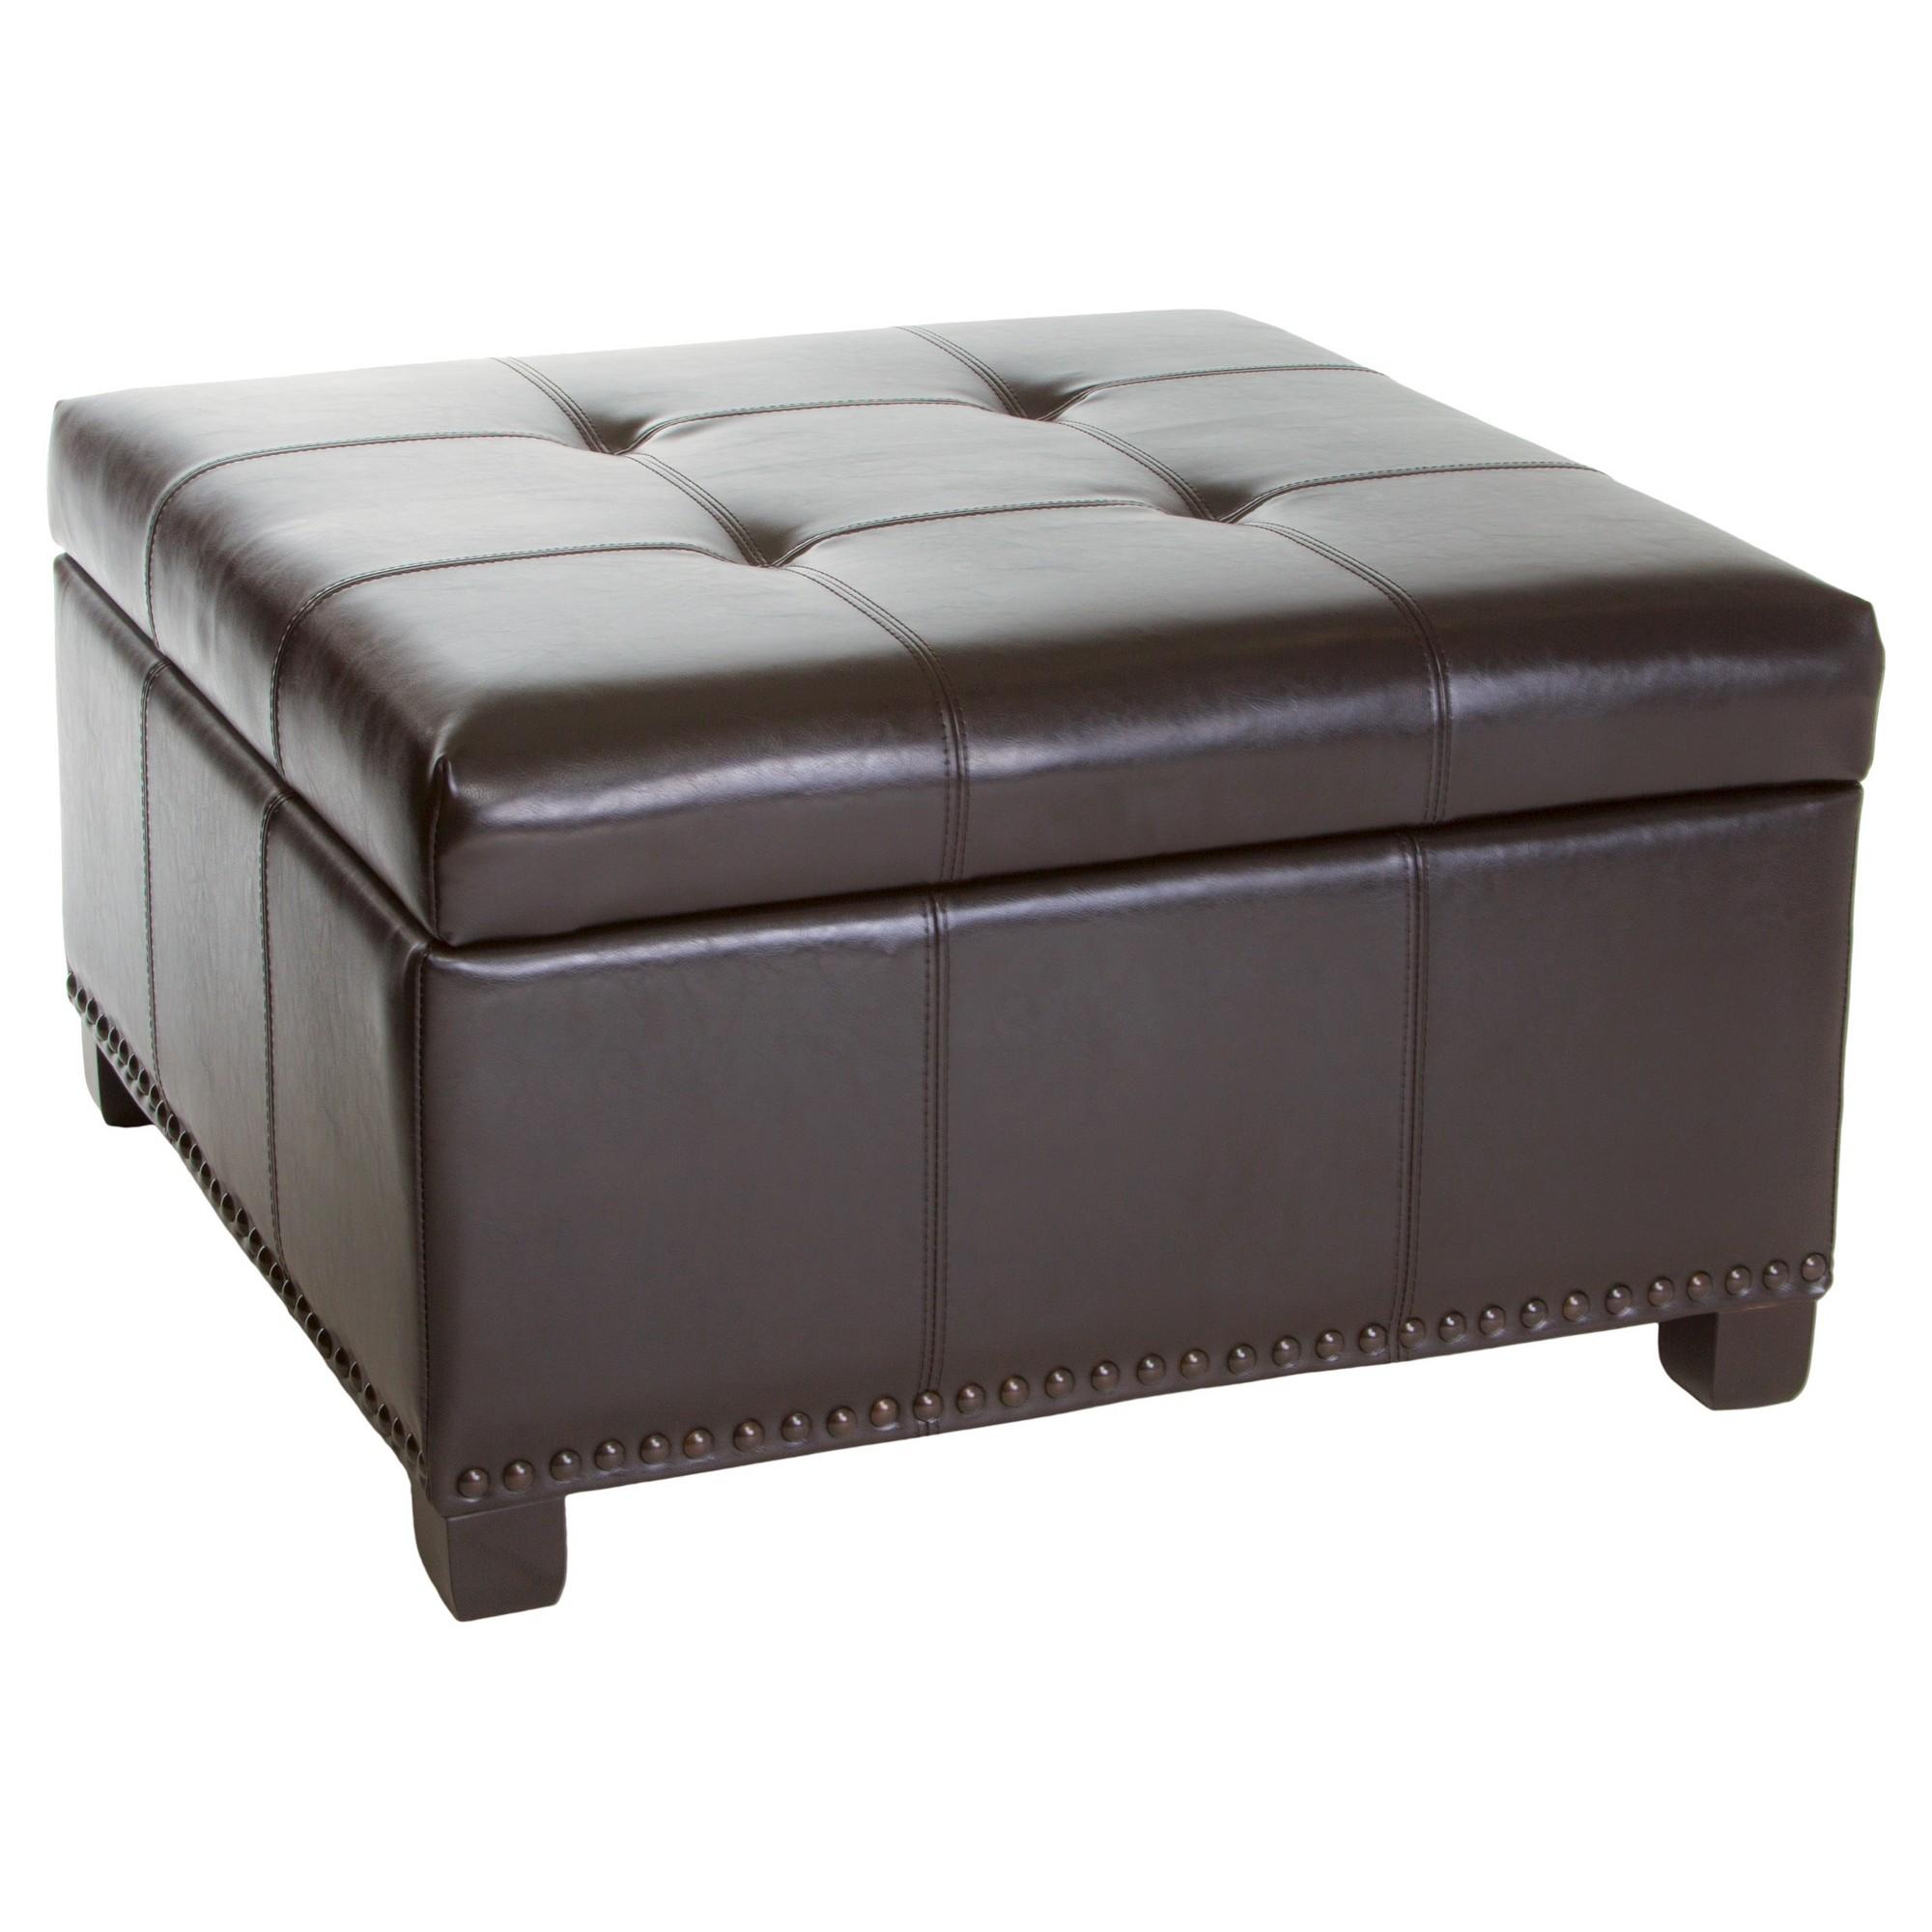 Shauna Espresso Brown Leather Interior Tray Storage Ottoman Christopher Knight Home